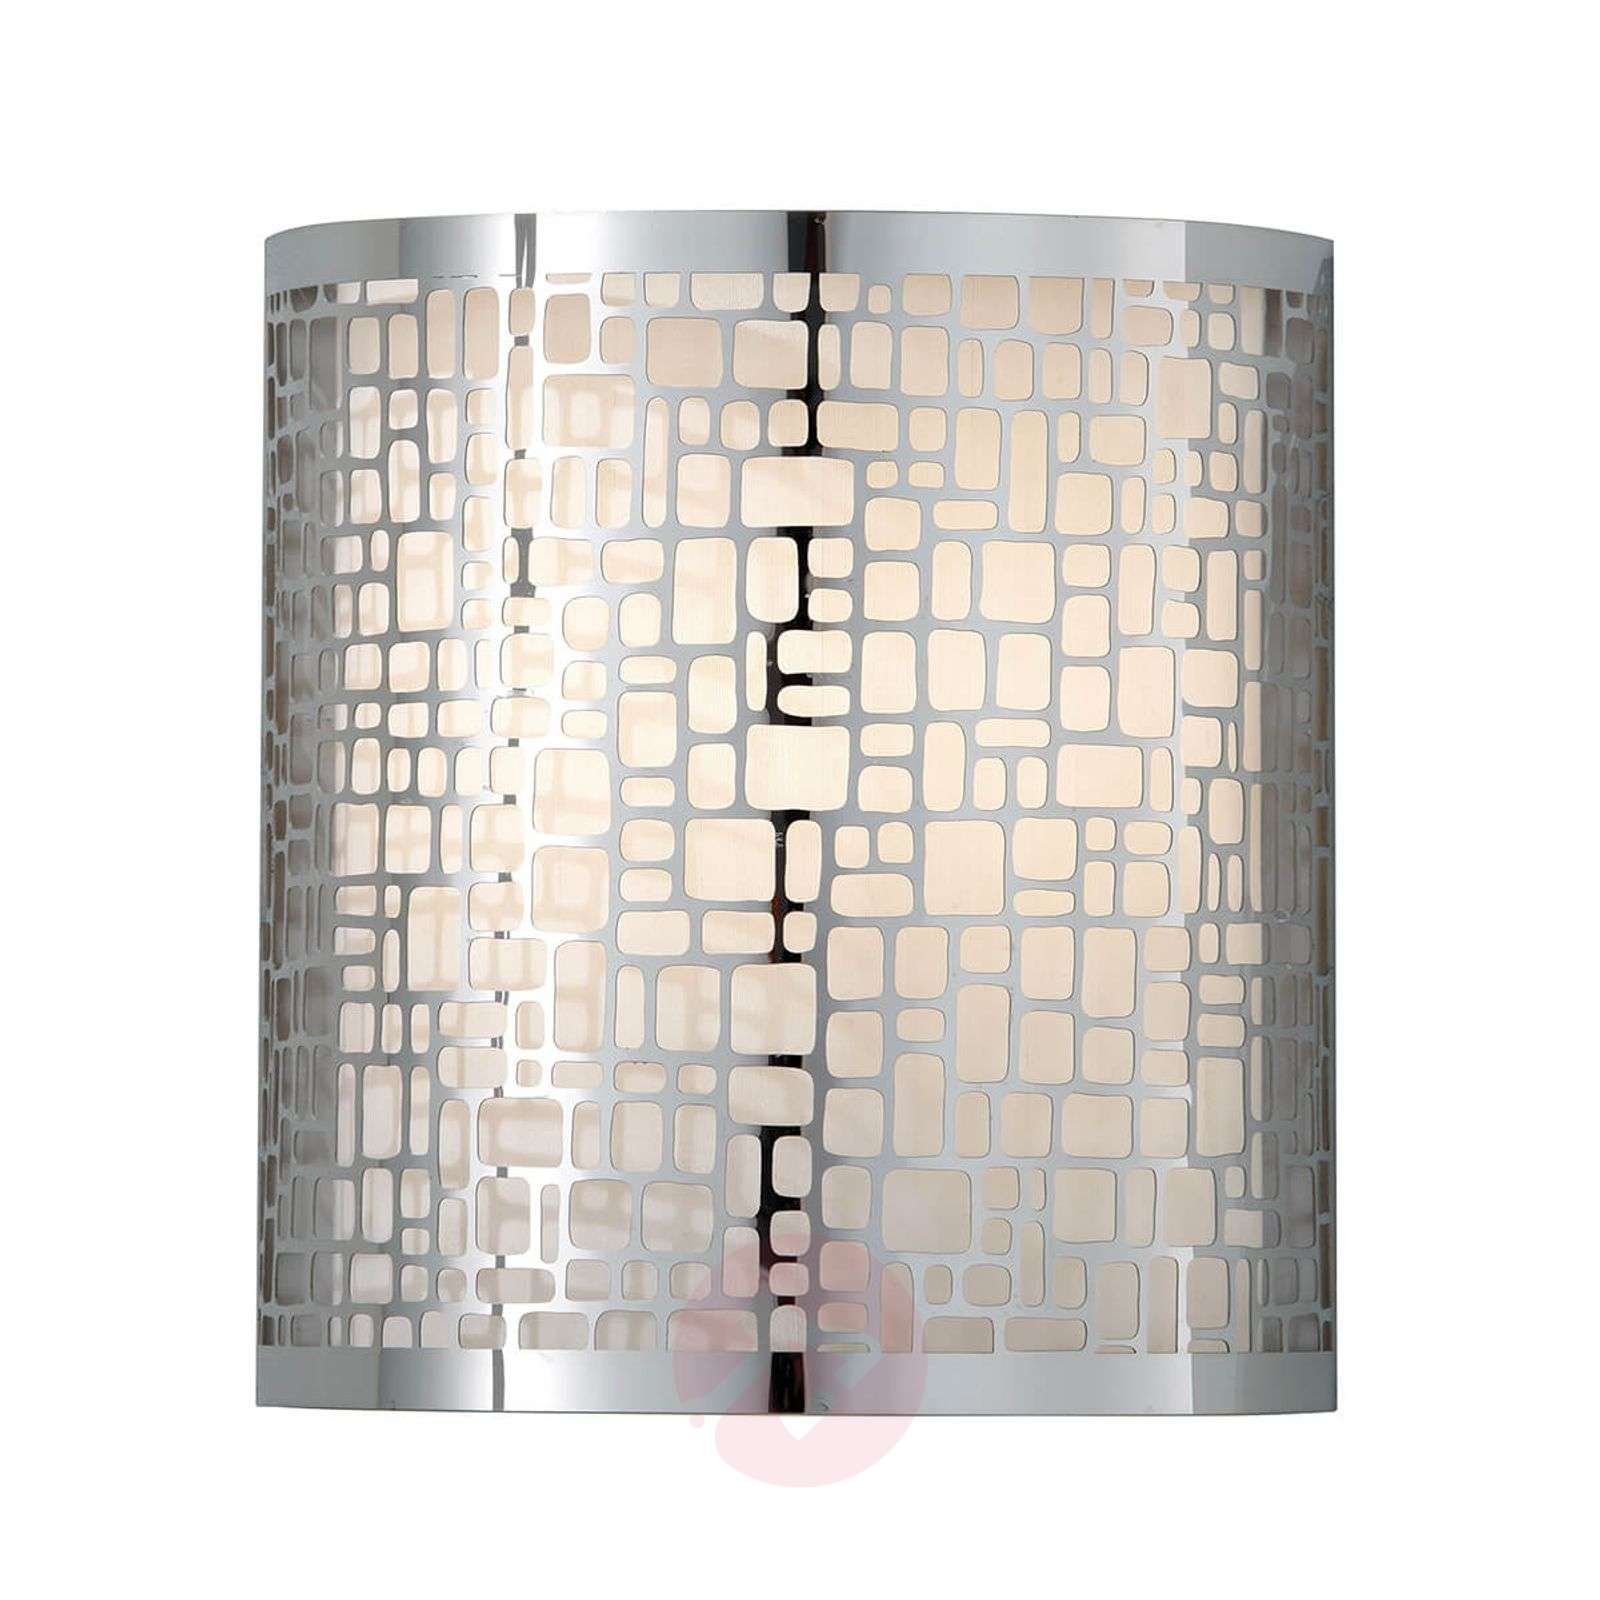 Splendid wall light Joplin-3048488-01